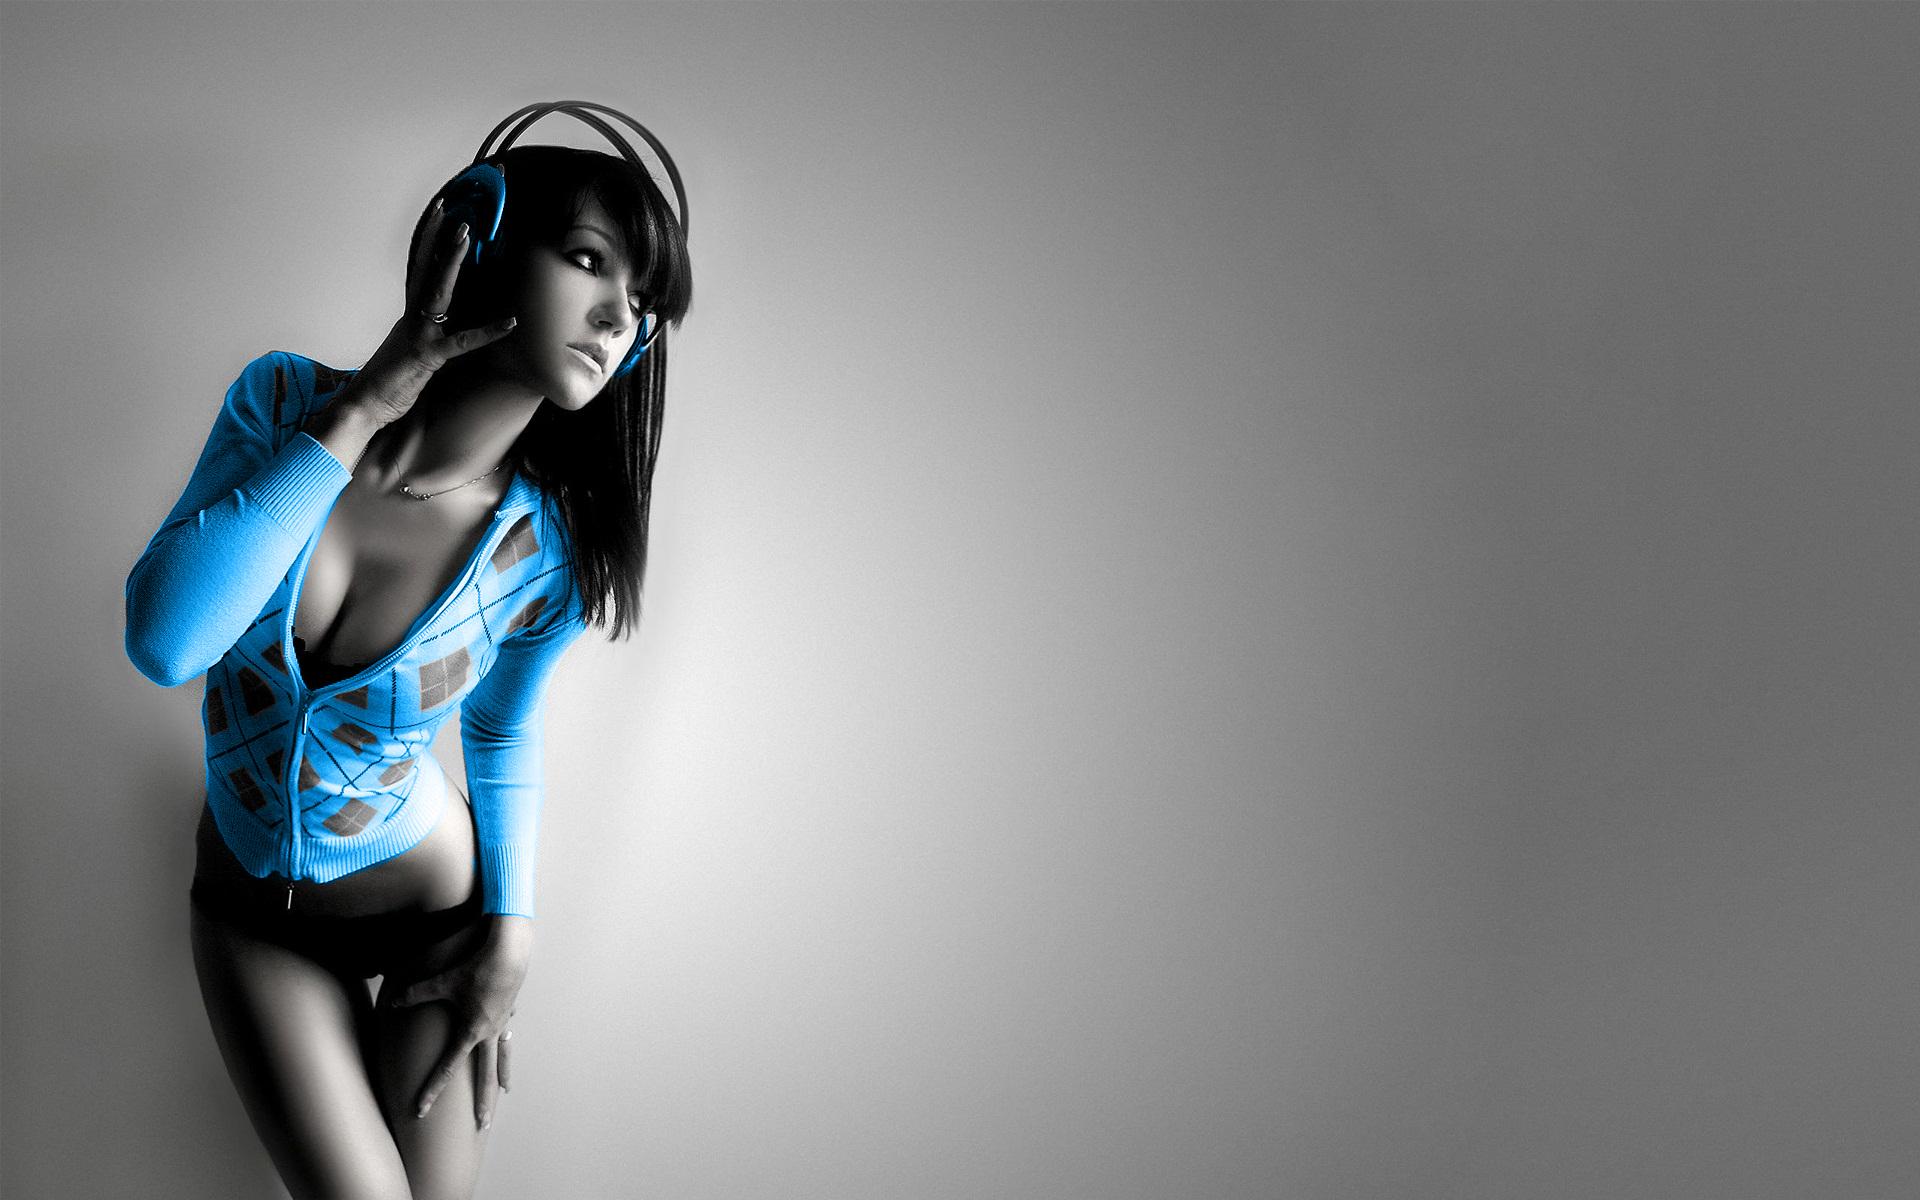 Hd wallpaper music - Music Girl Wallpaper 1920x1200 Music Girl Electric Blue Looking